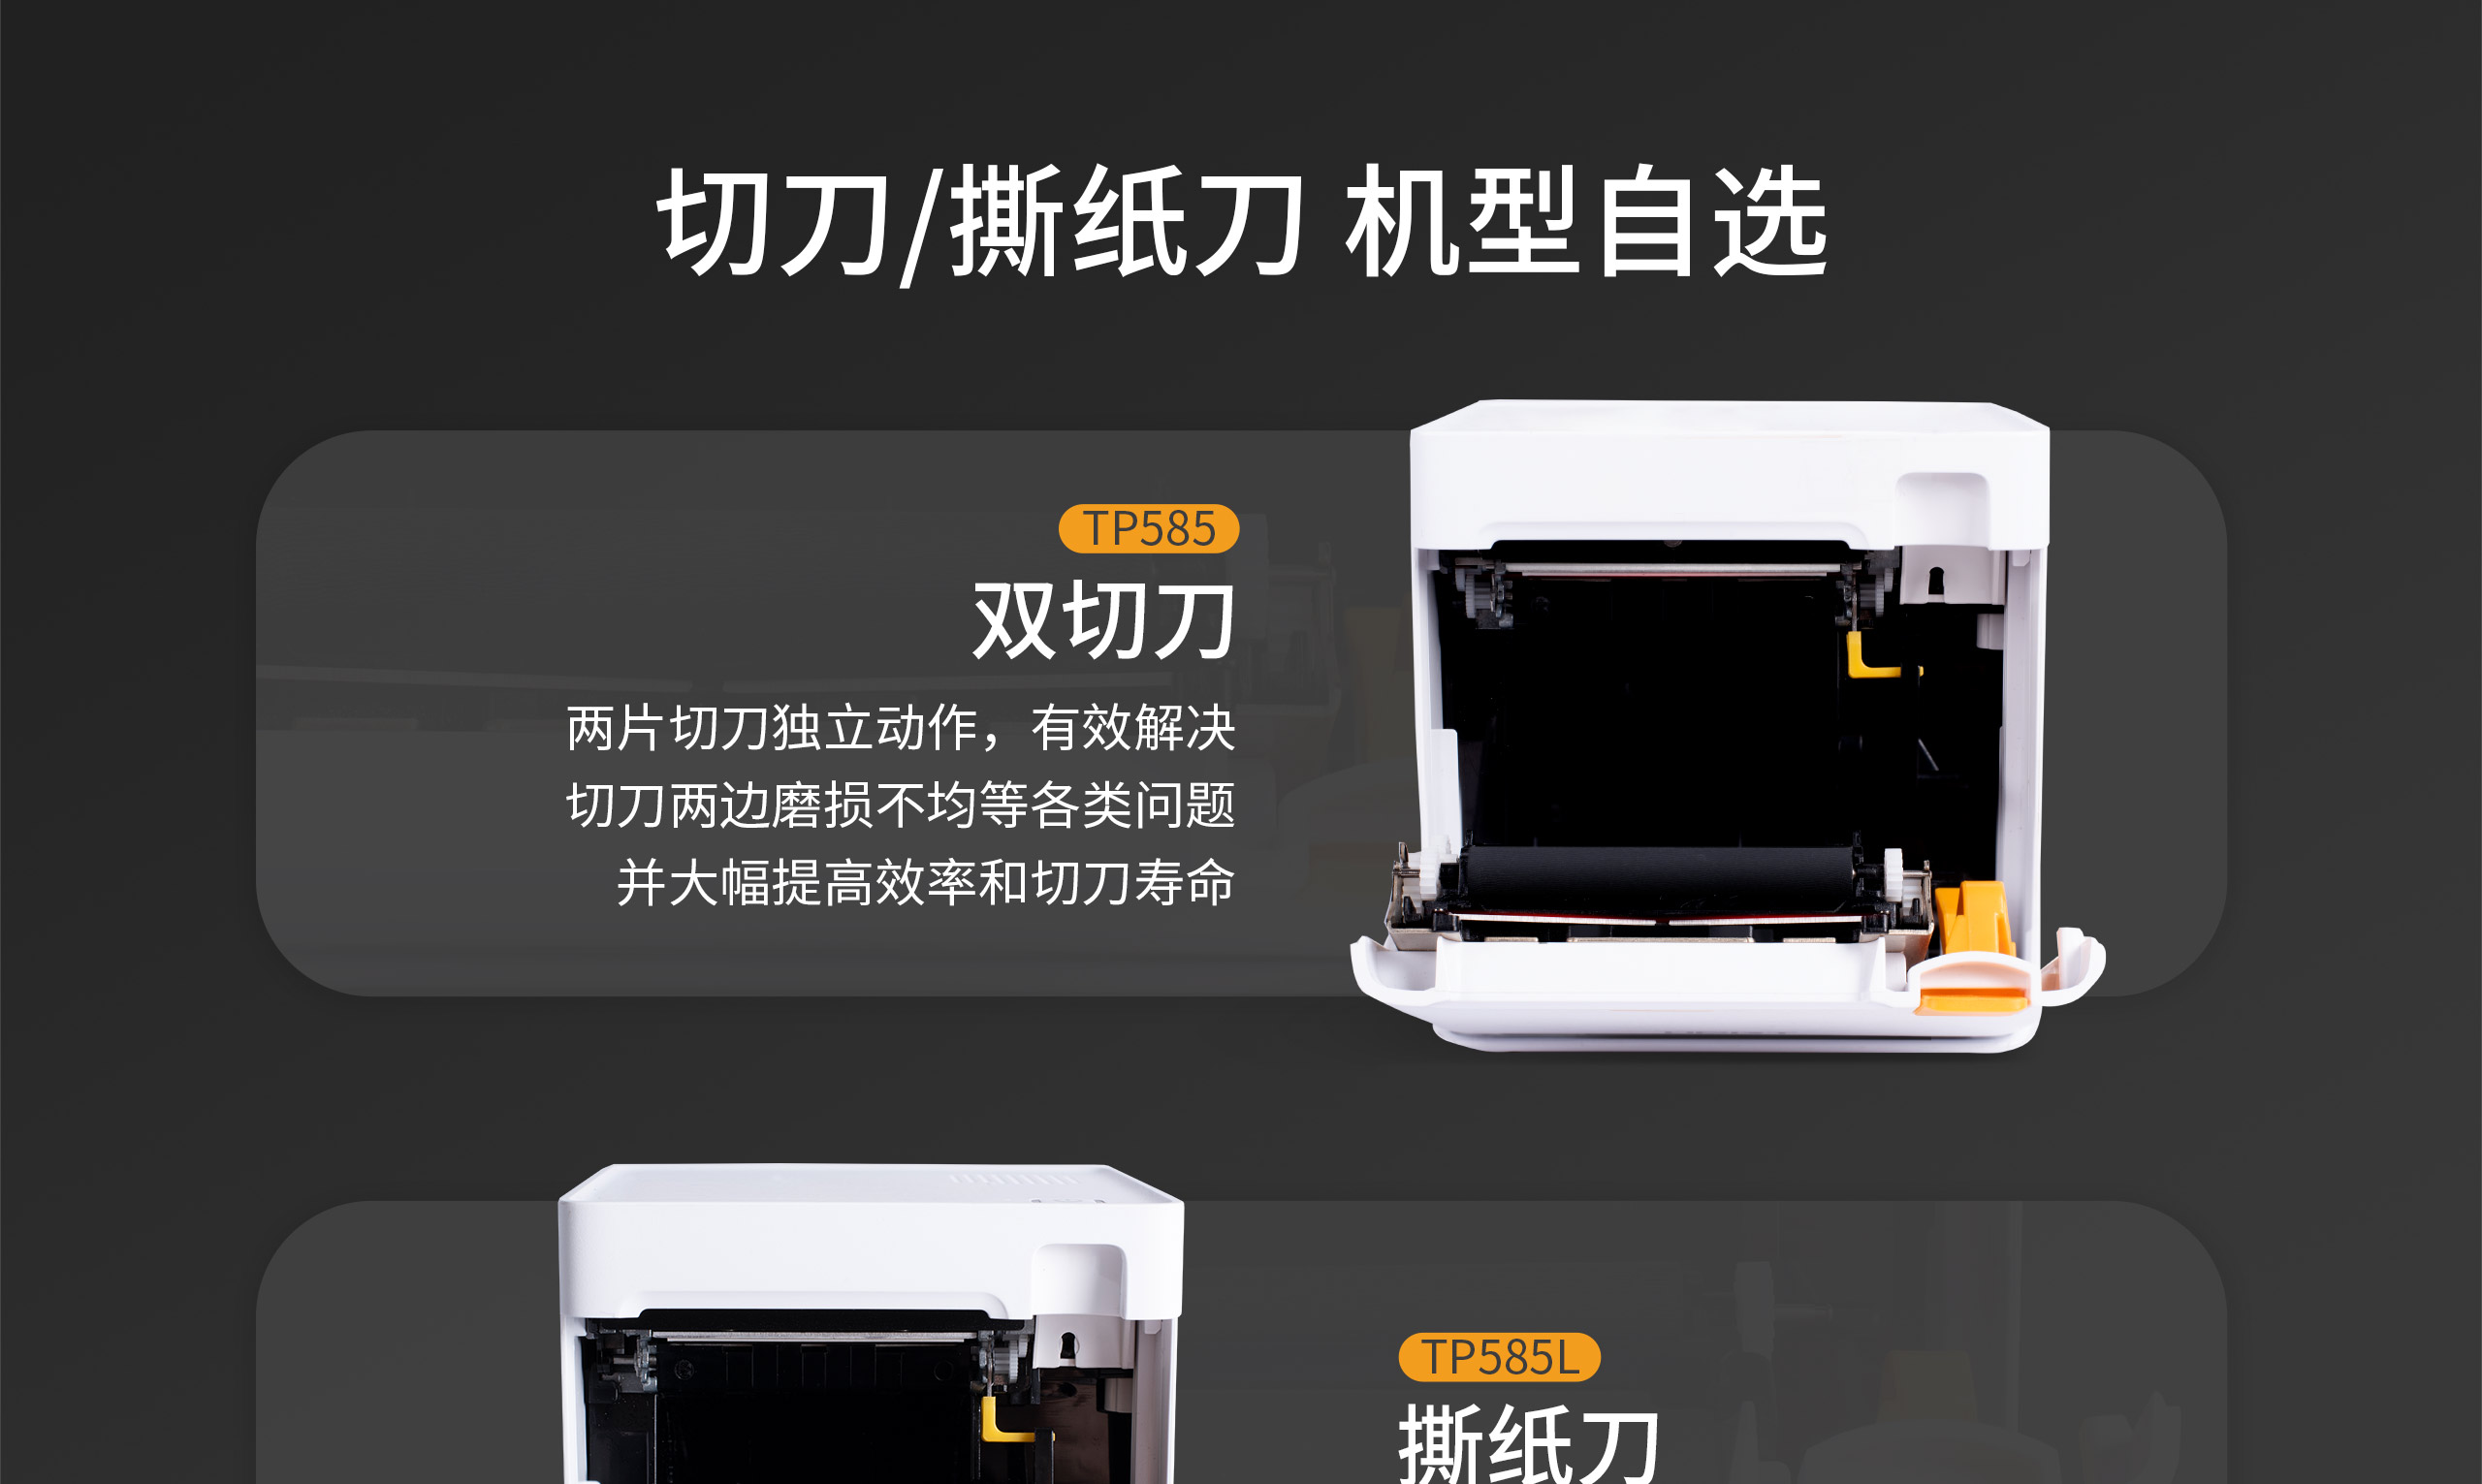 TP585/TP585L热敏打印机  第6张